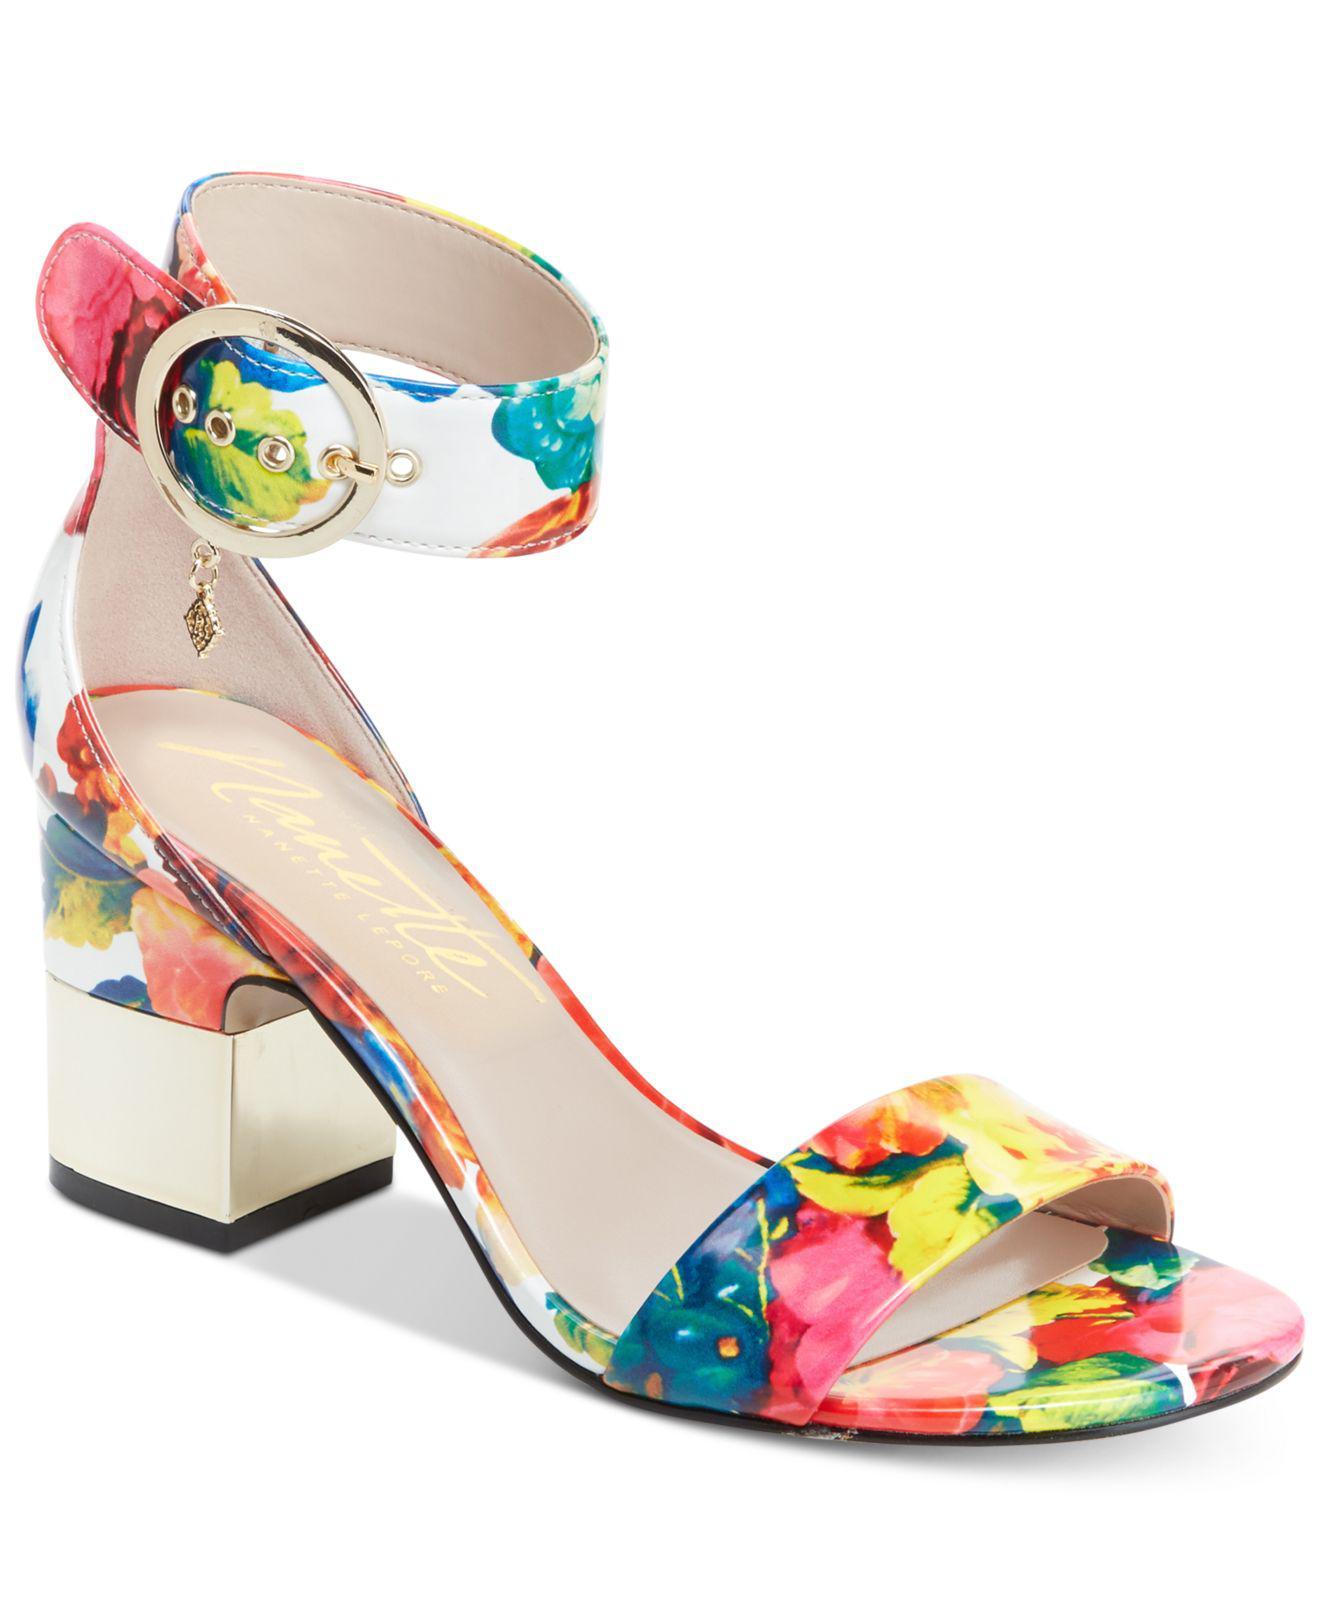 NANETTE nanette lepore Thora Floral Ankle Strap Sandal tjMLM9Fr